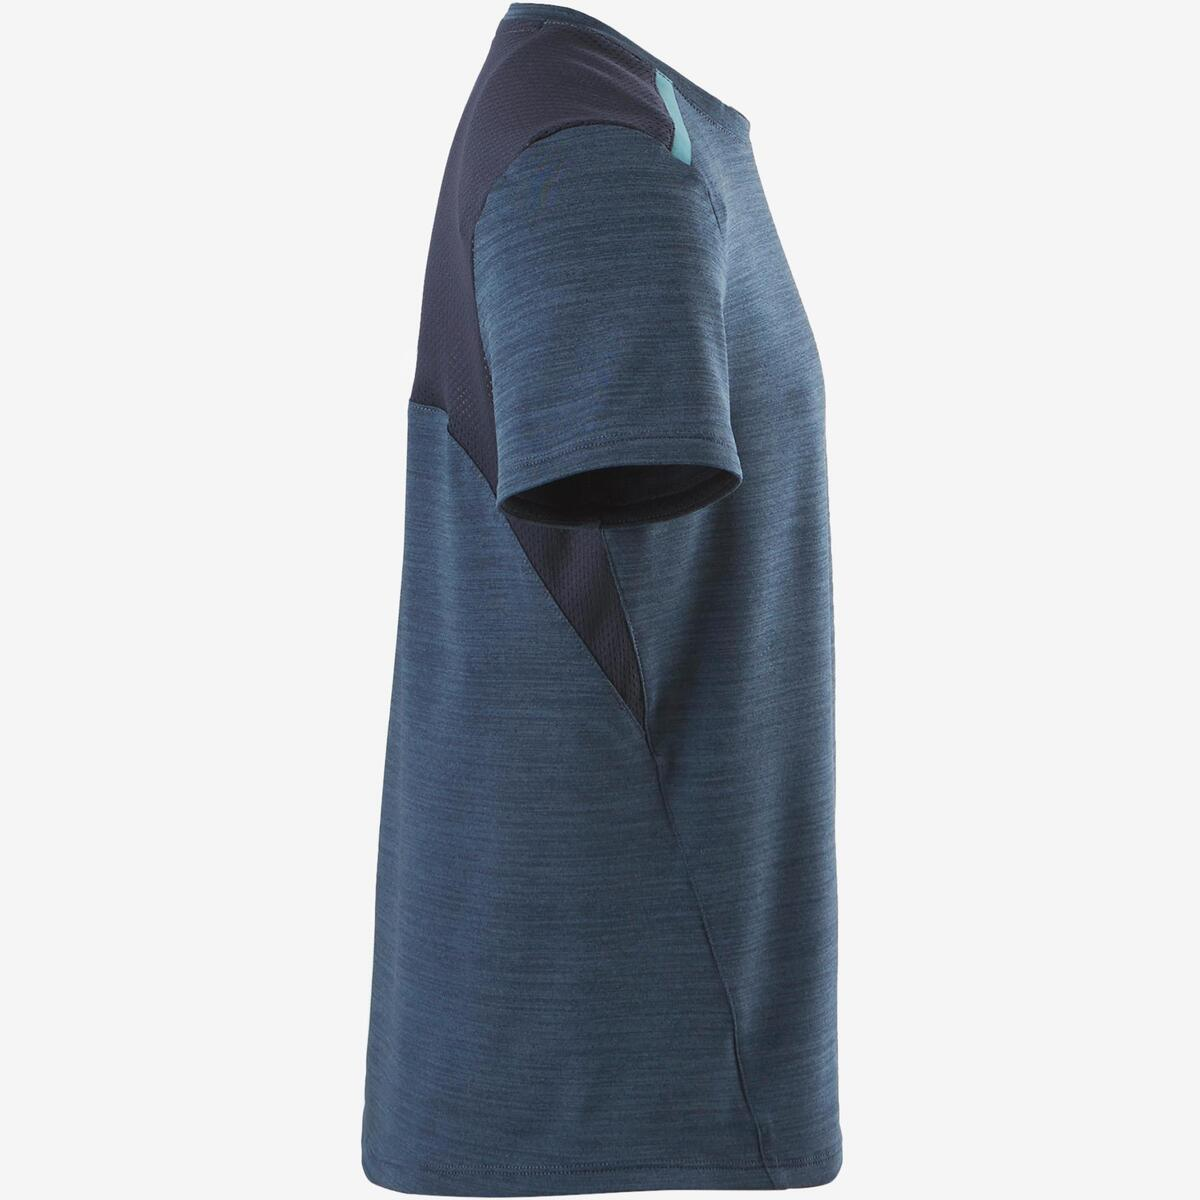 Bild 3 von T-Shirt Synthetik atmungsaktiv S500 Gym Kinder dunkelblau